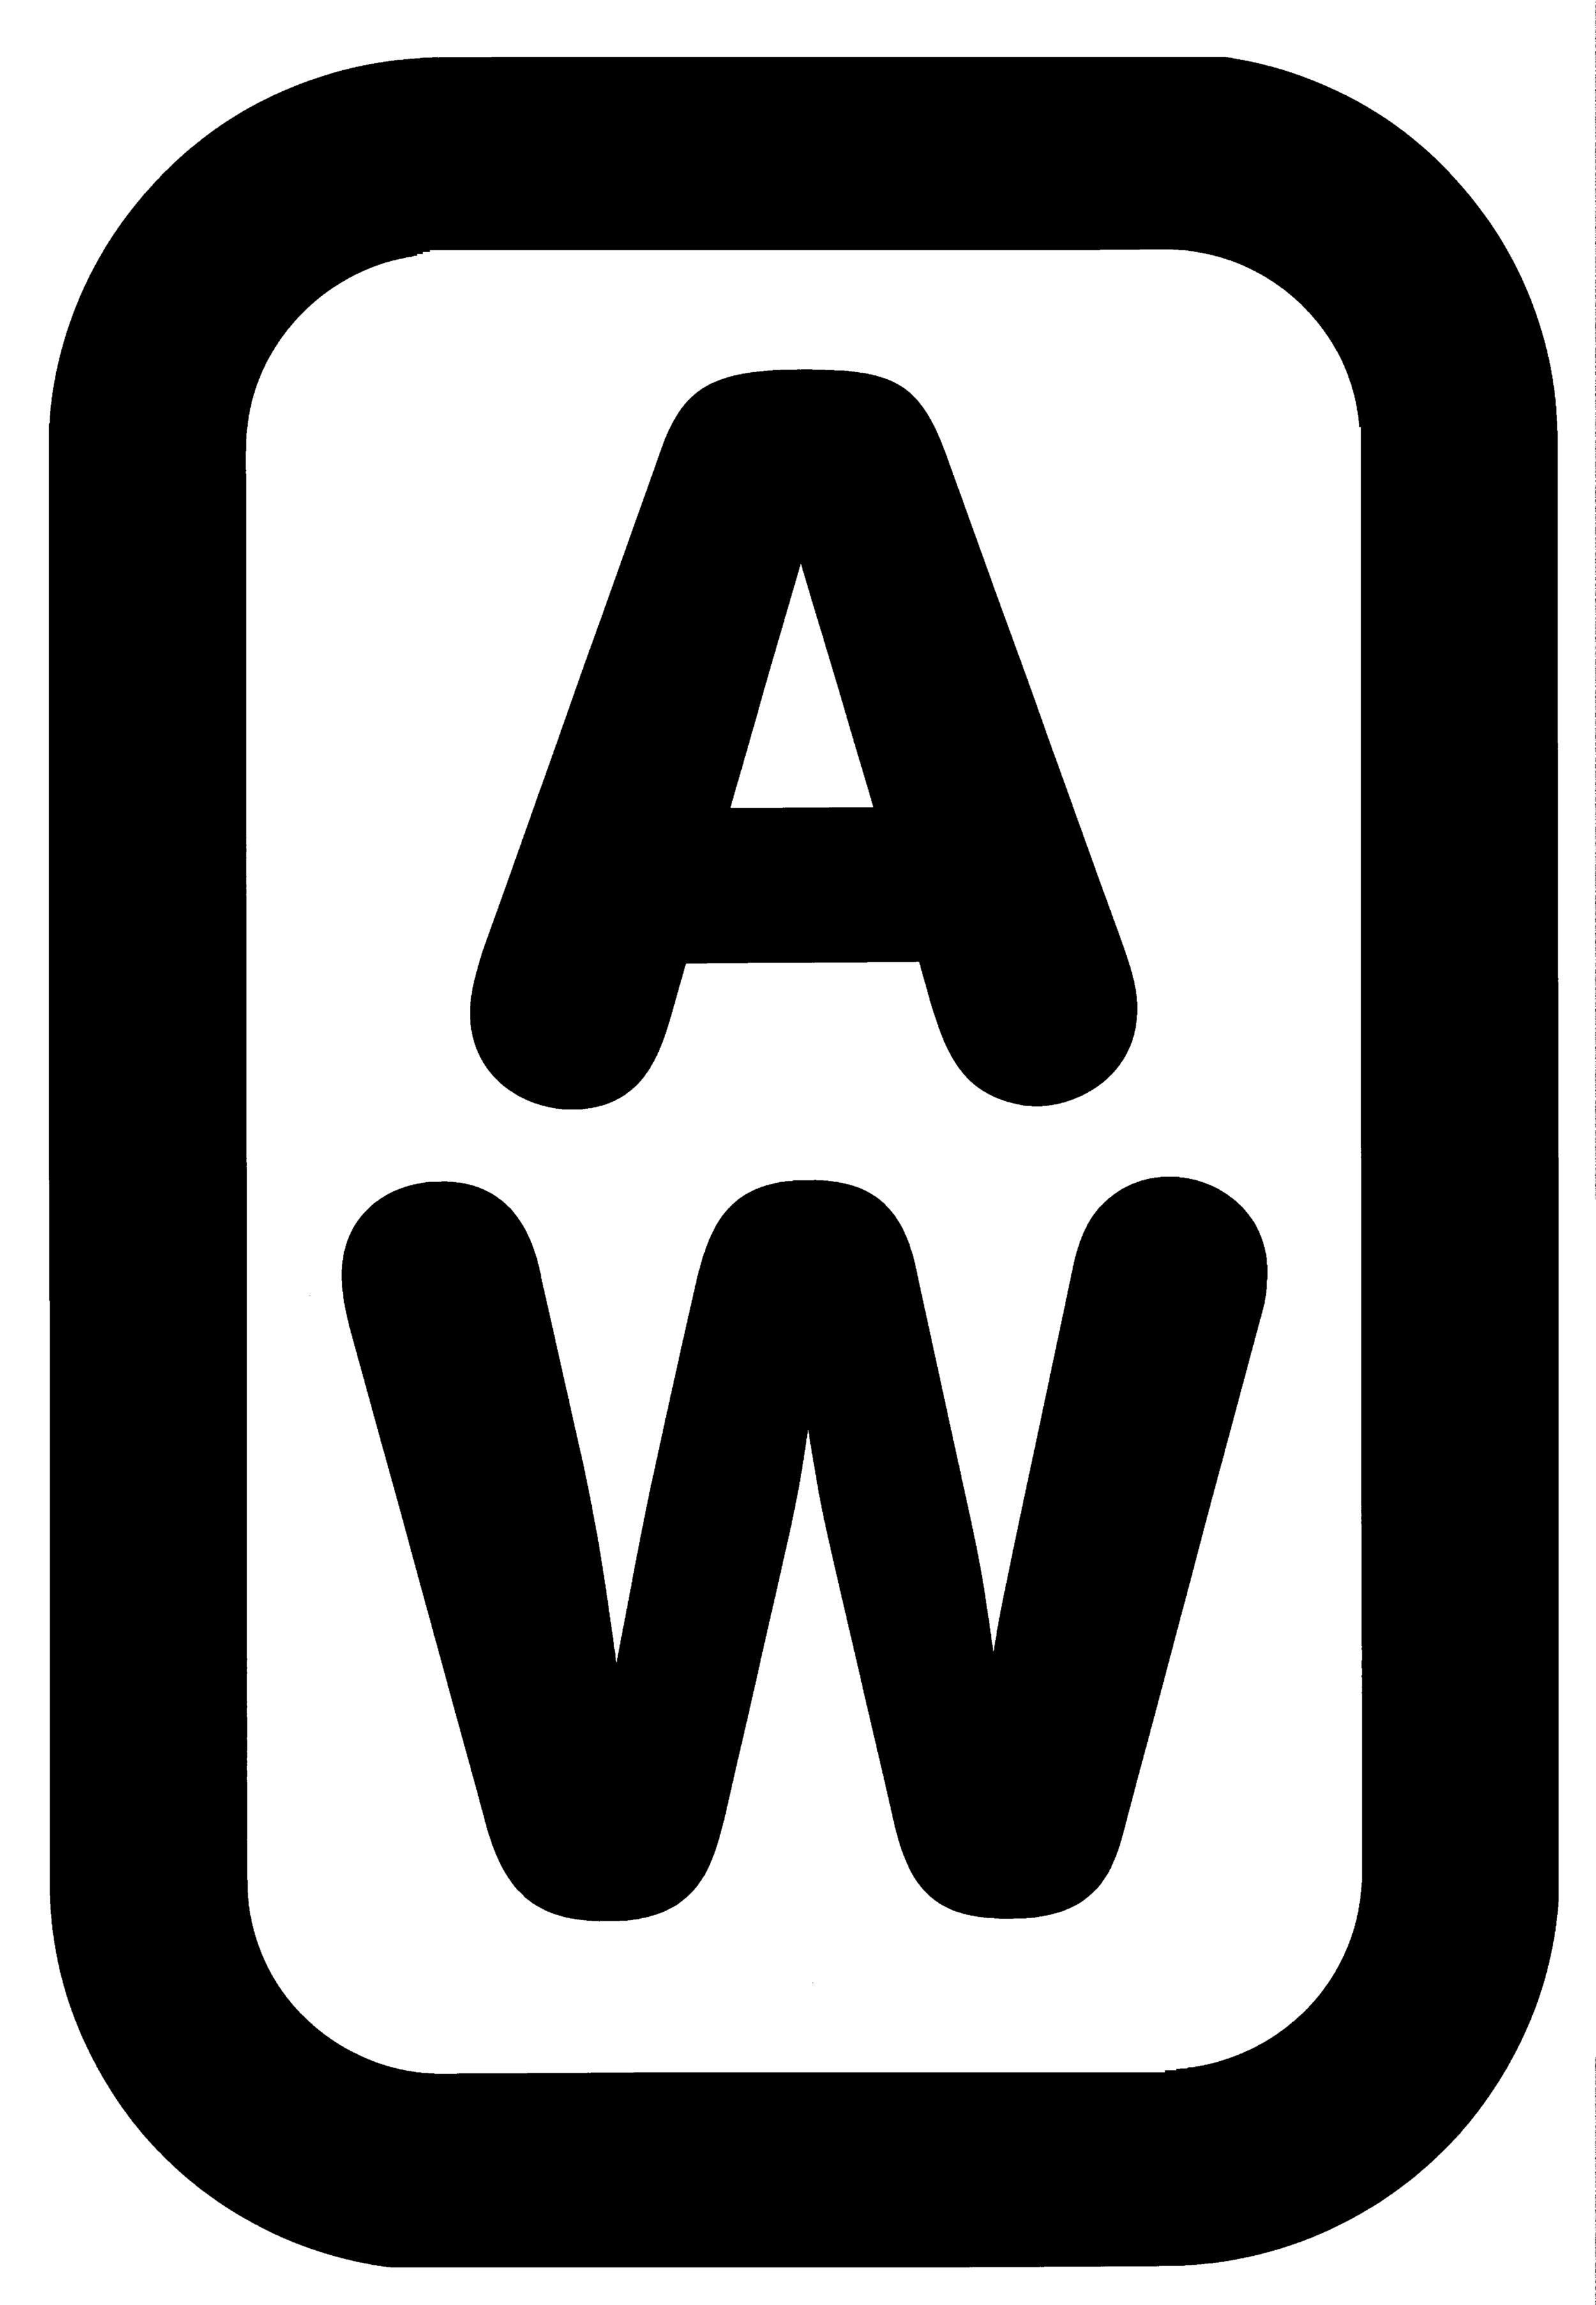 aw_logo.jpg